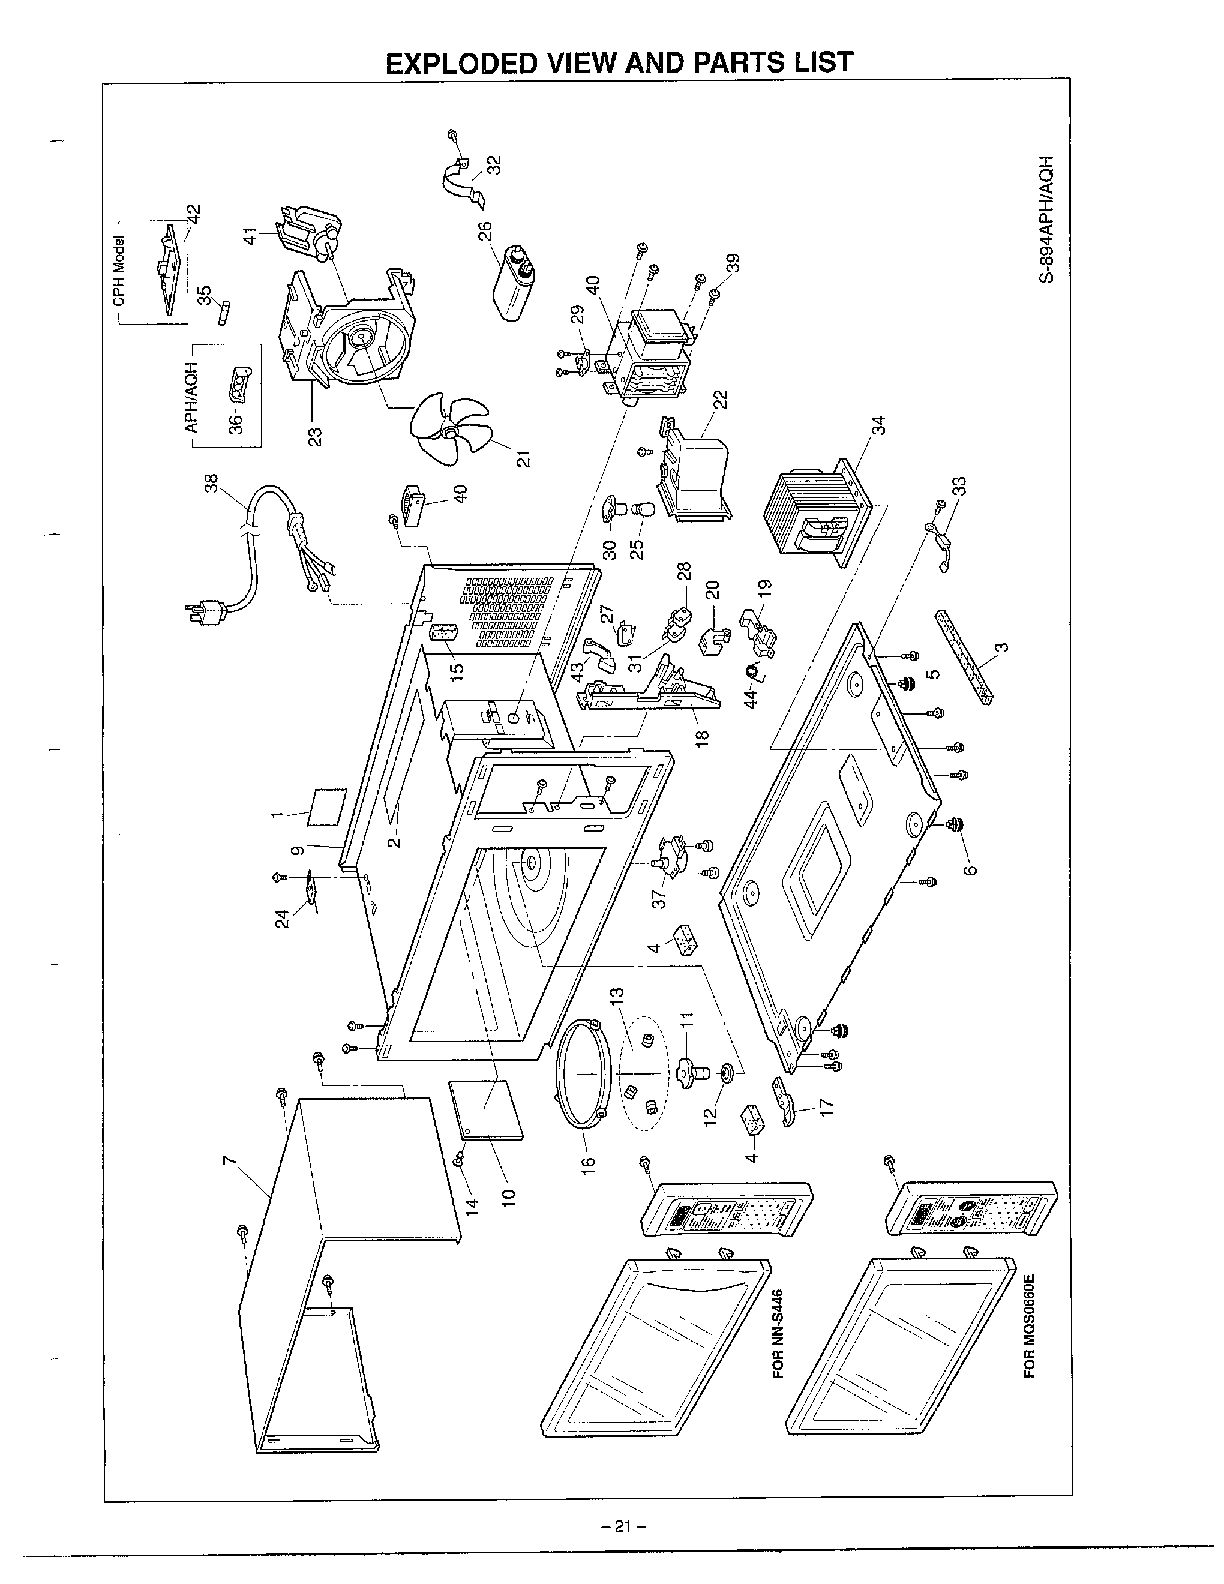 Fortable ski doo wiring diagrams contemporary wiring schematics